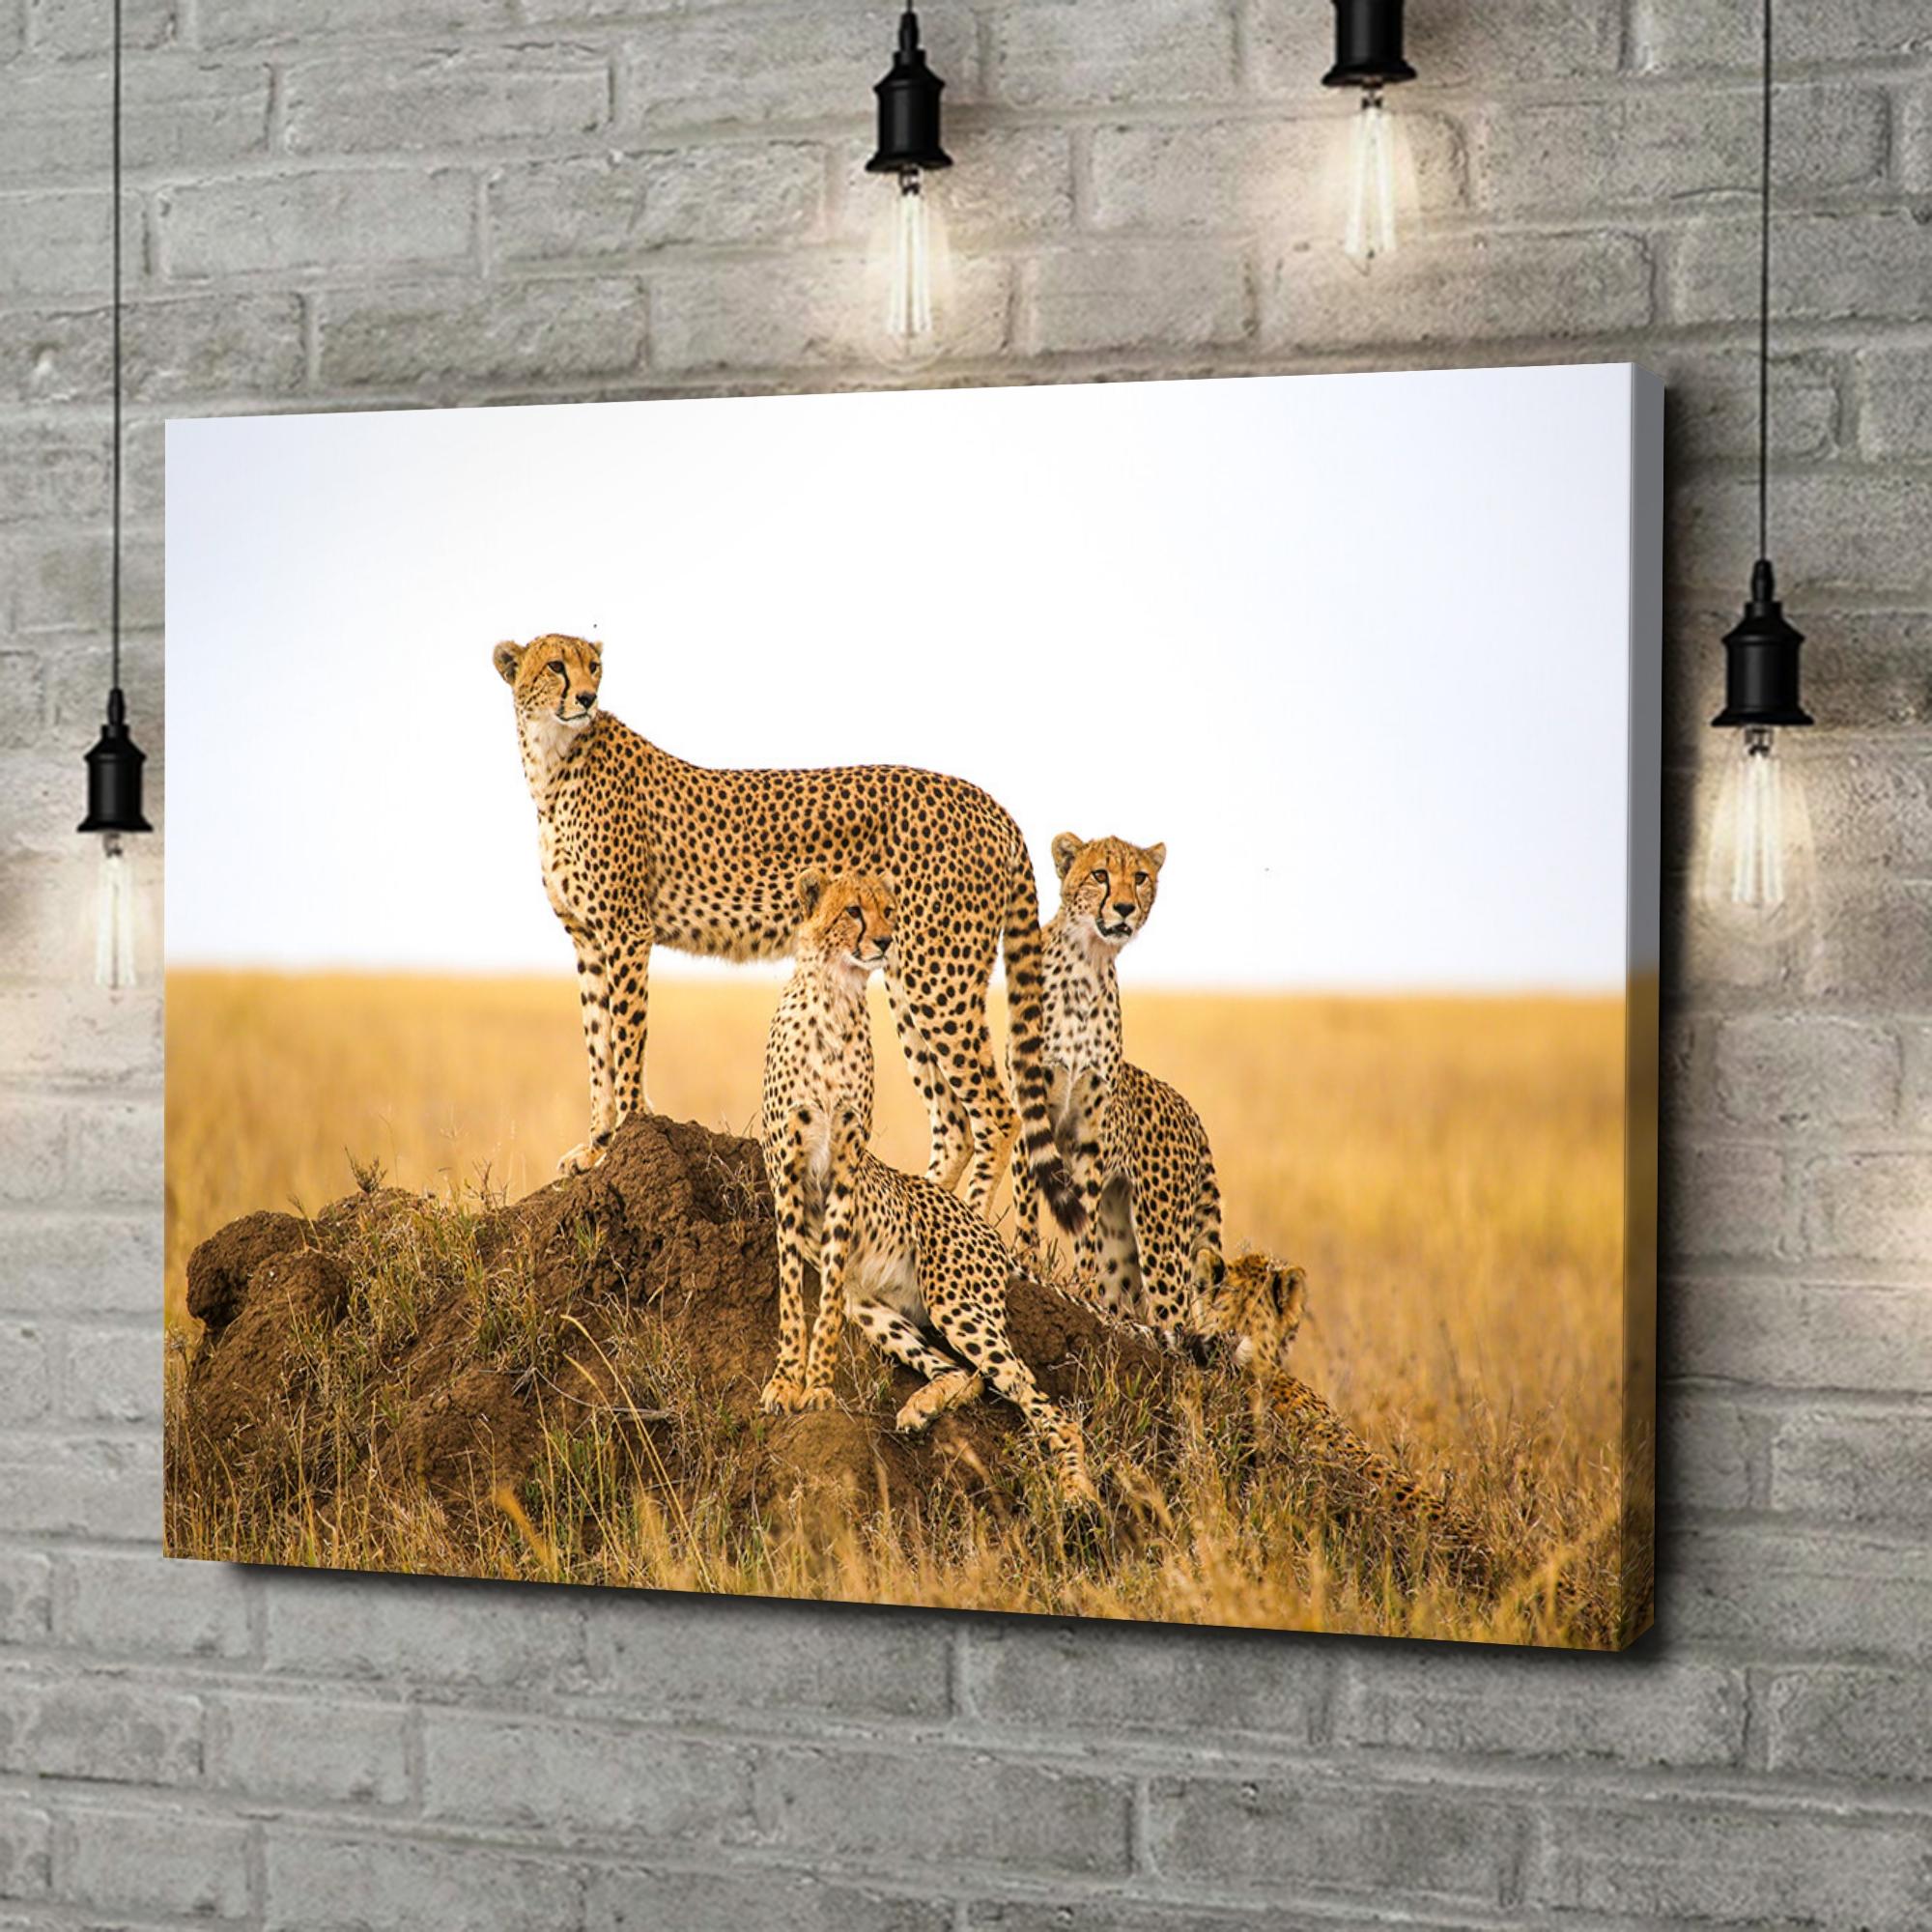 Leinwandbild personalisiert Geparden Serengeti